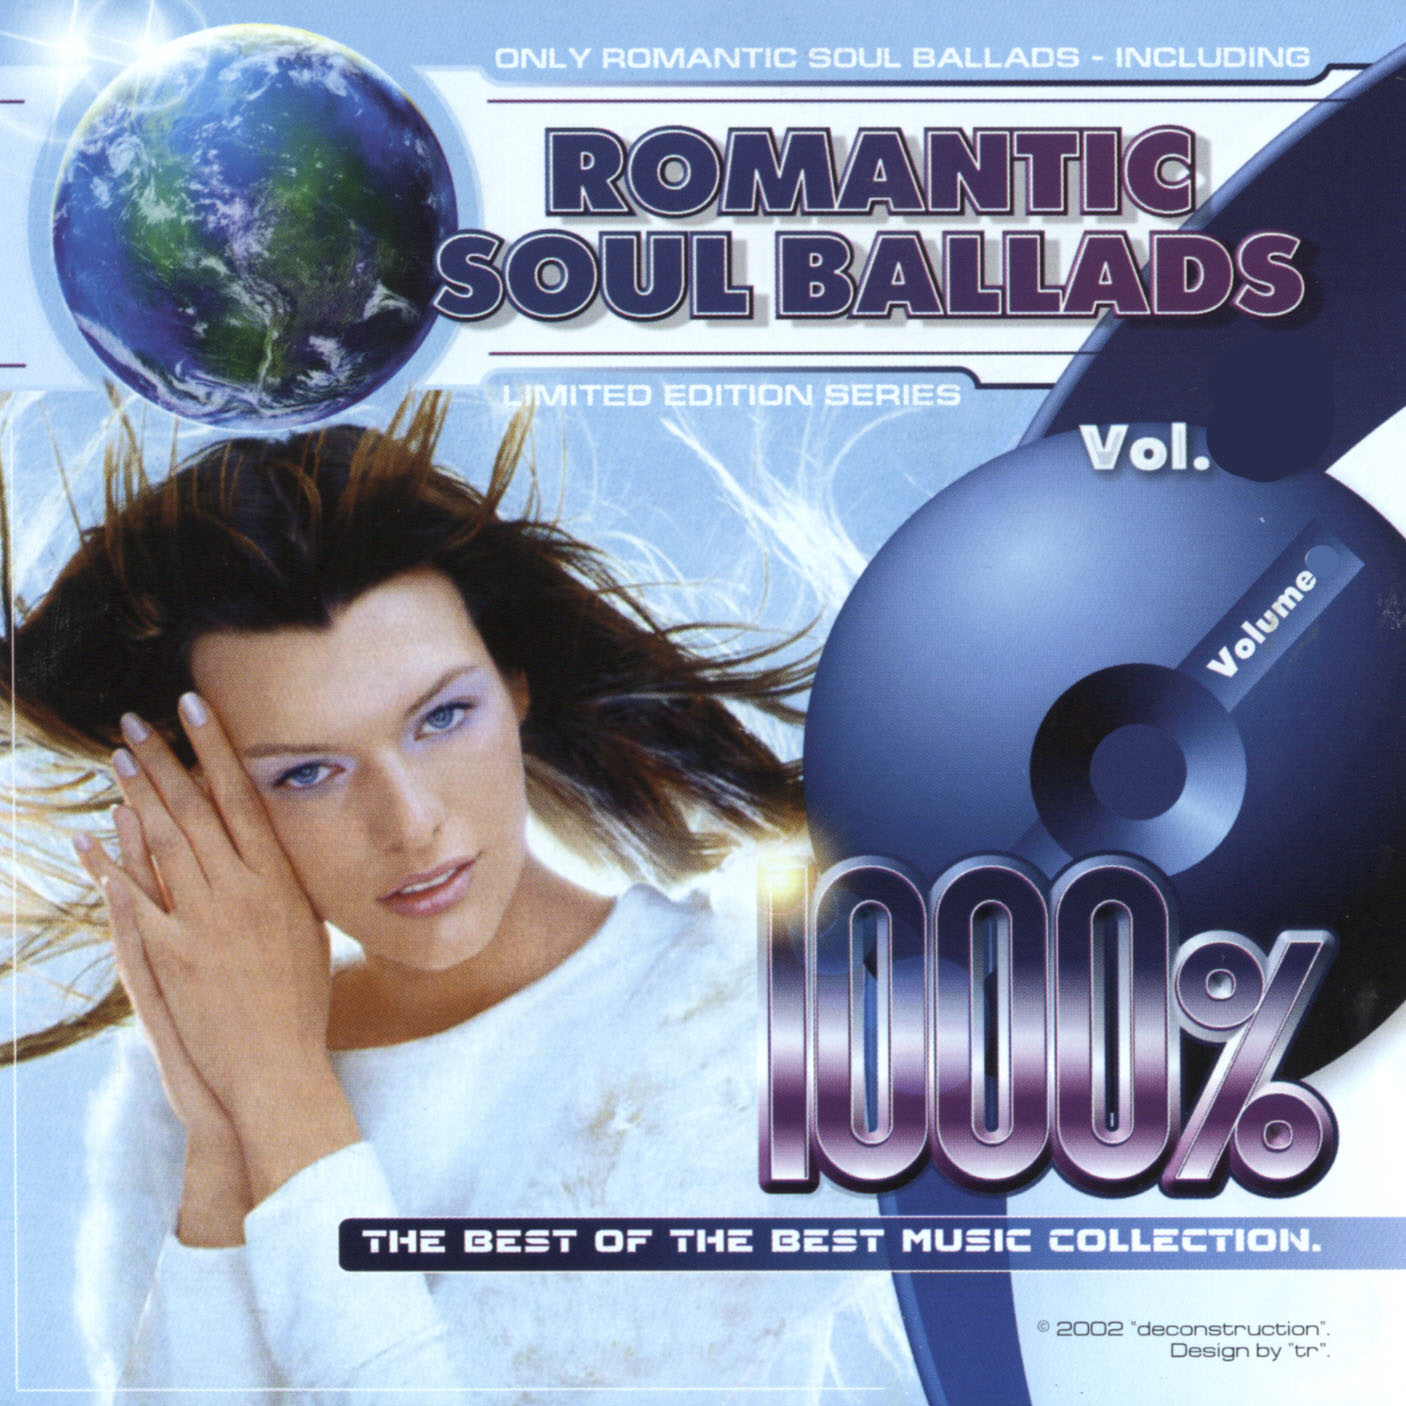 http://3.bp.blogspot.com/_r4diHjT_JrE/TE0GsVSqtOI/AAAAAAAABhI/Ma6ZoBV8e4c/s1600/VA+-+1000%25+Romantic+Soul+Ballads.jpg